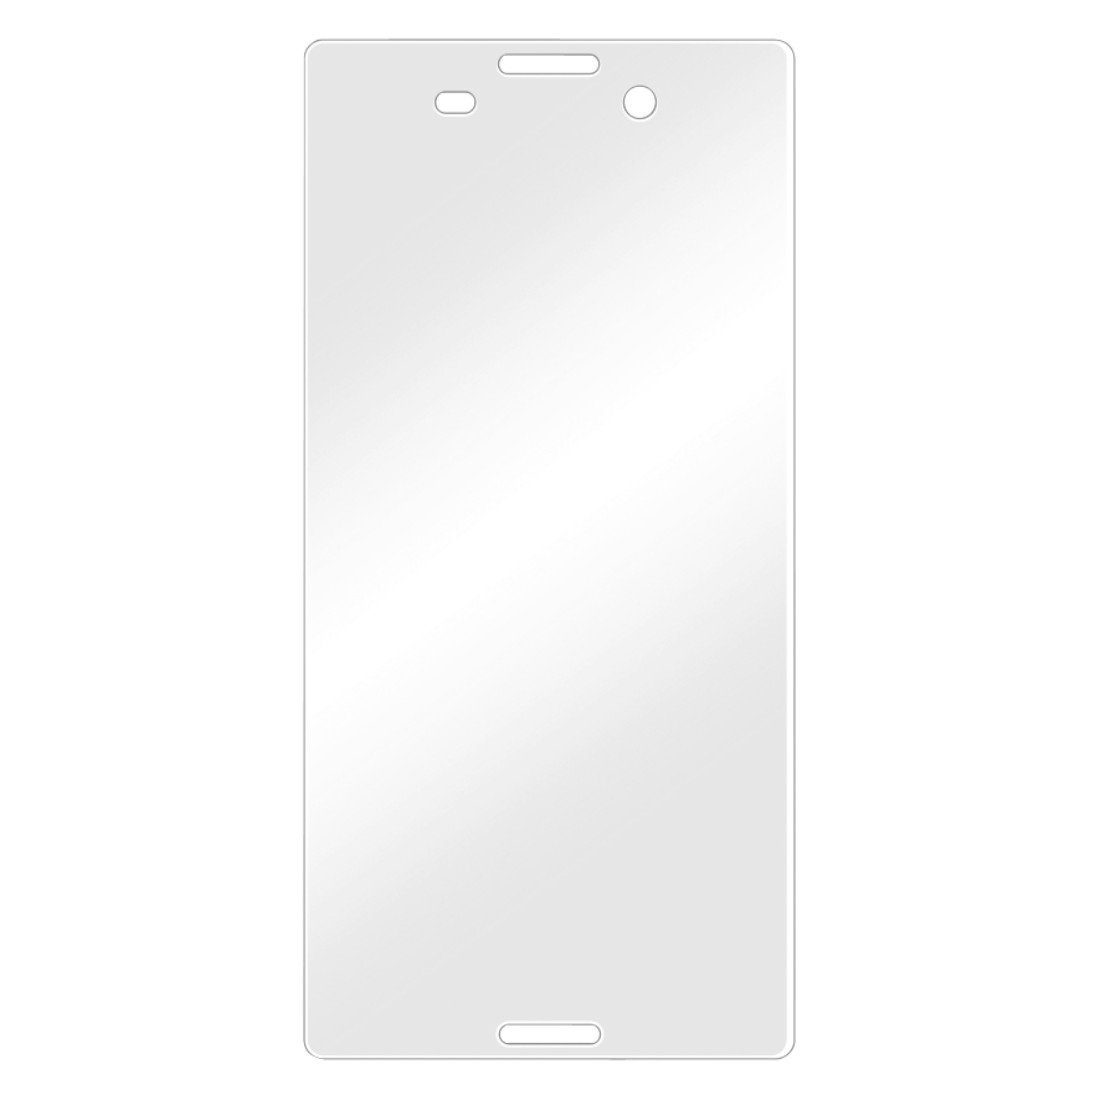 Hama Displayschutzfolie für Sony Xperia M4 Aqua, 2er Set Folie »Displayschutz Schutzfolie«